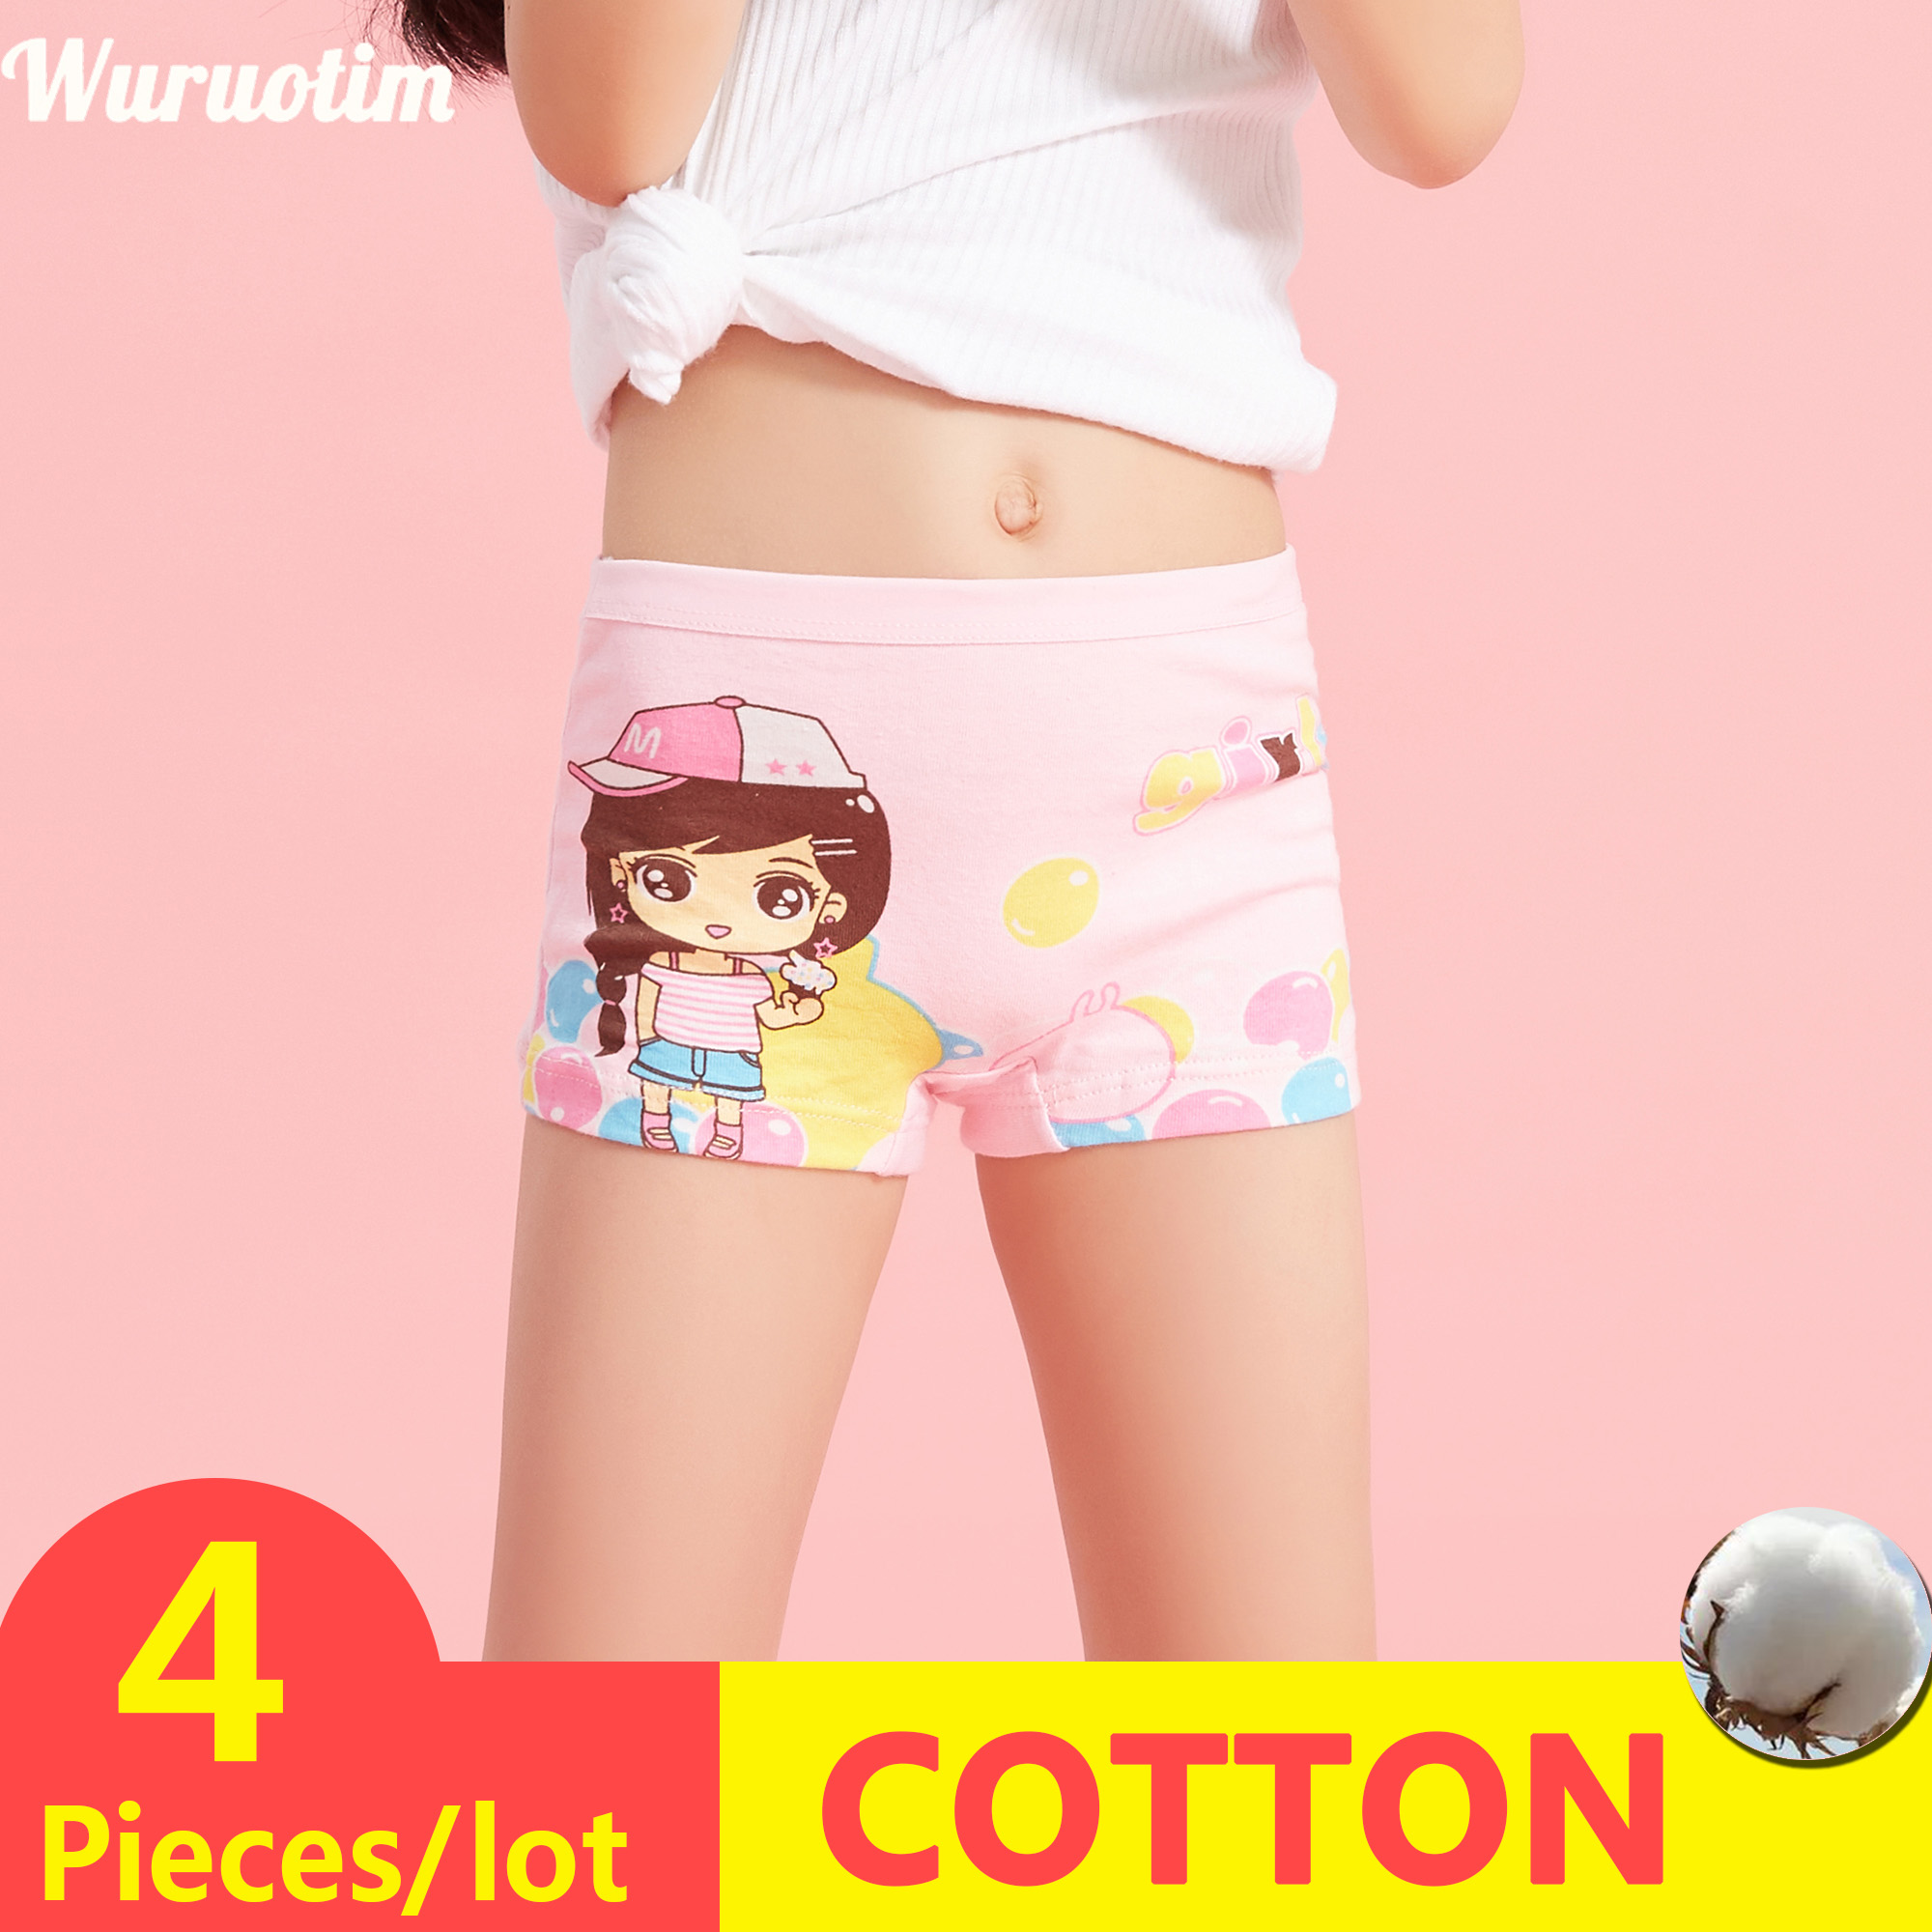 4 Pieces/lot New Design Children Girl Panties Cotton Soft Pretty Cartoon Child Underwear For Kids Boxer Girls Panties Breathable